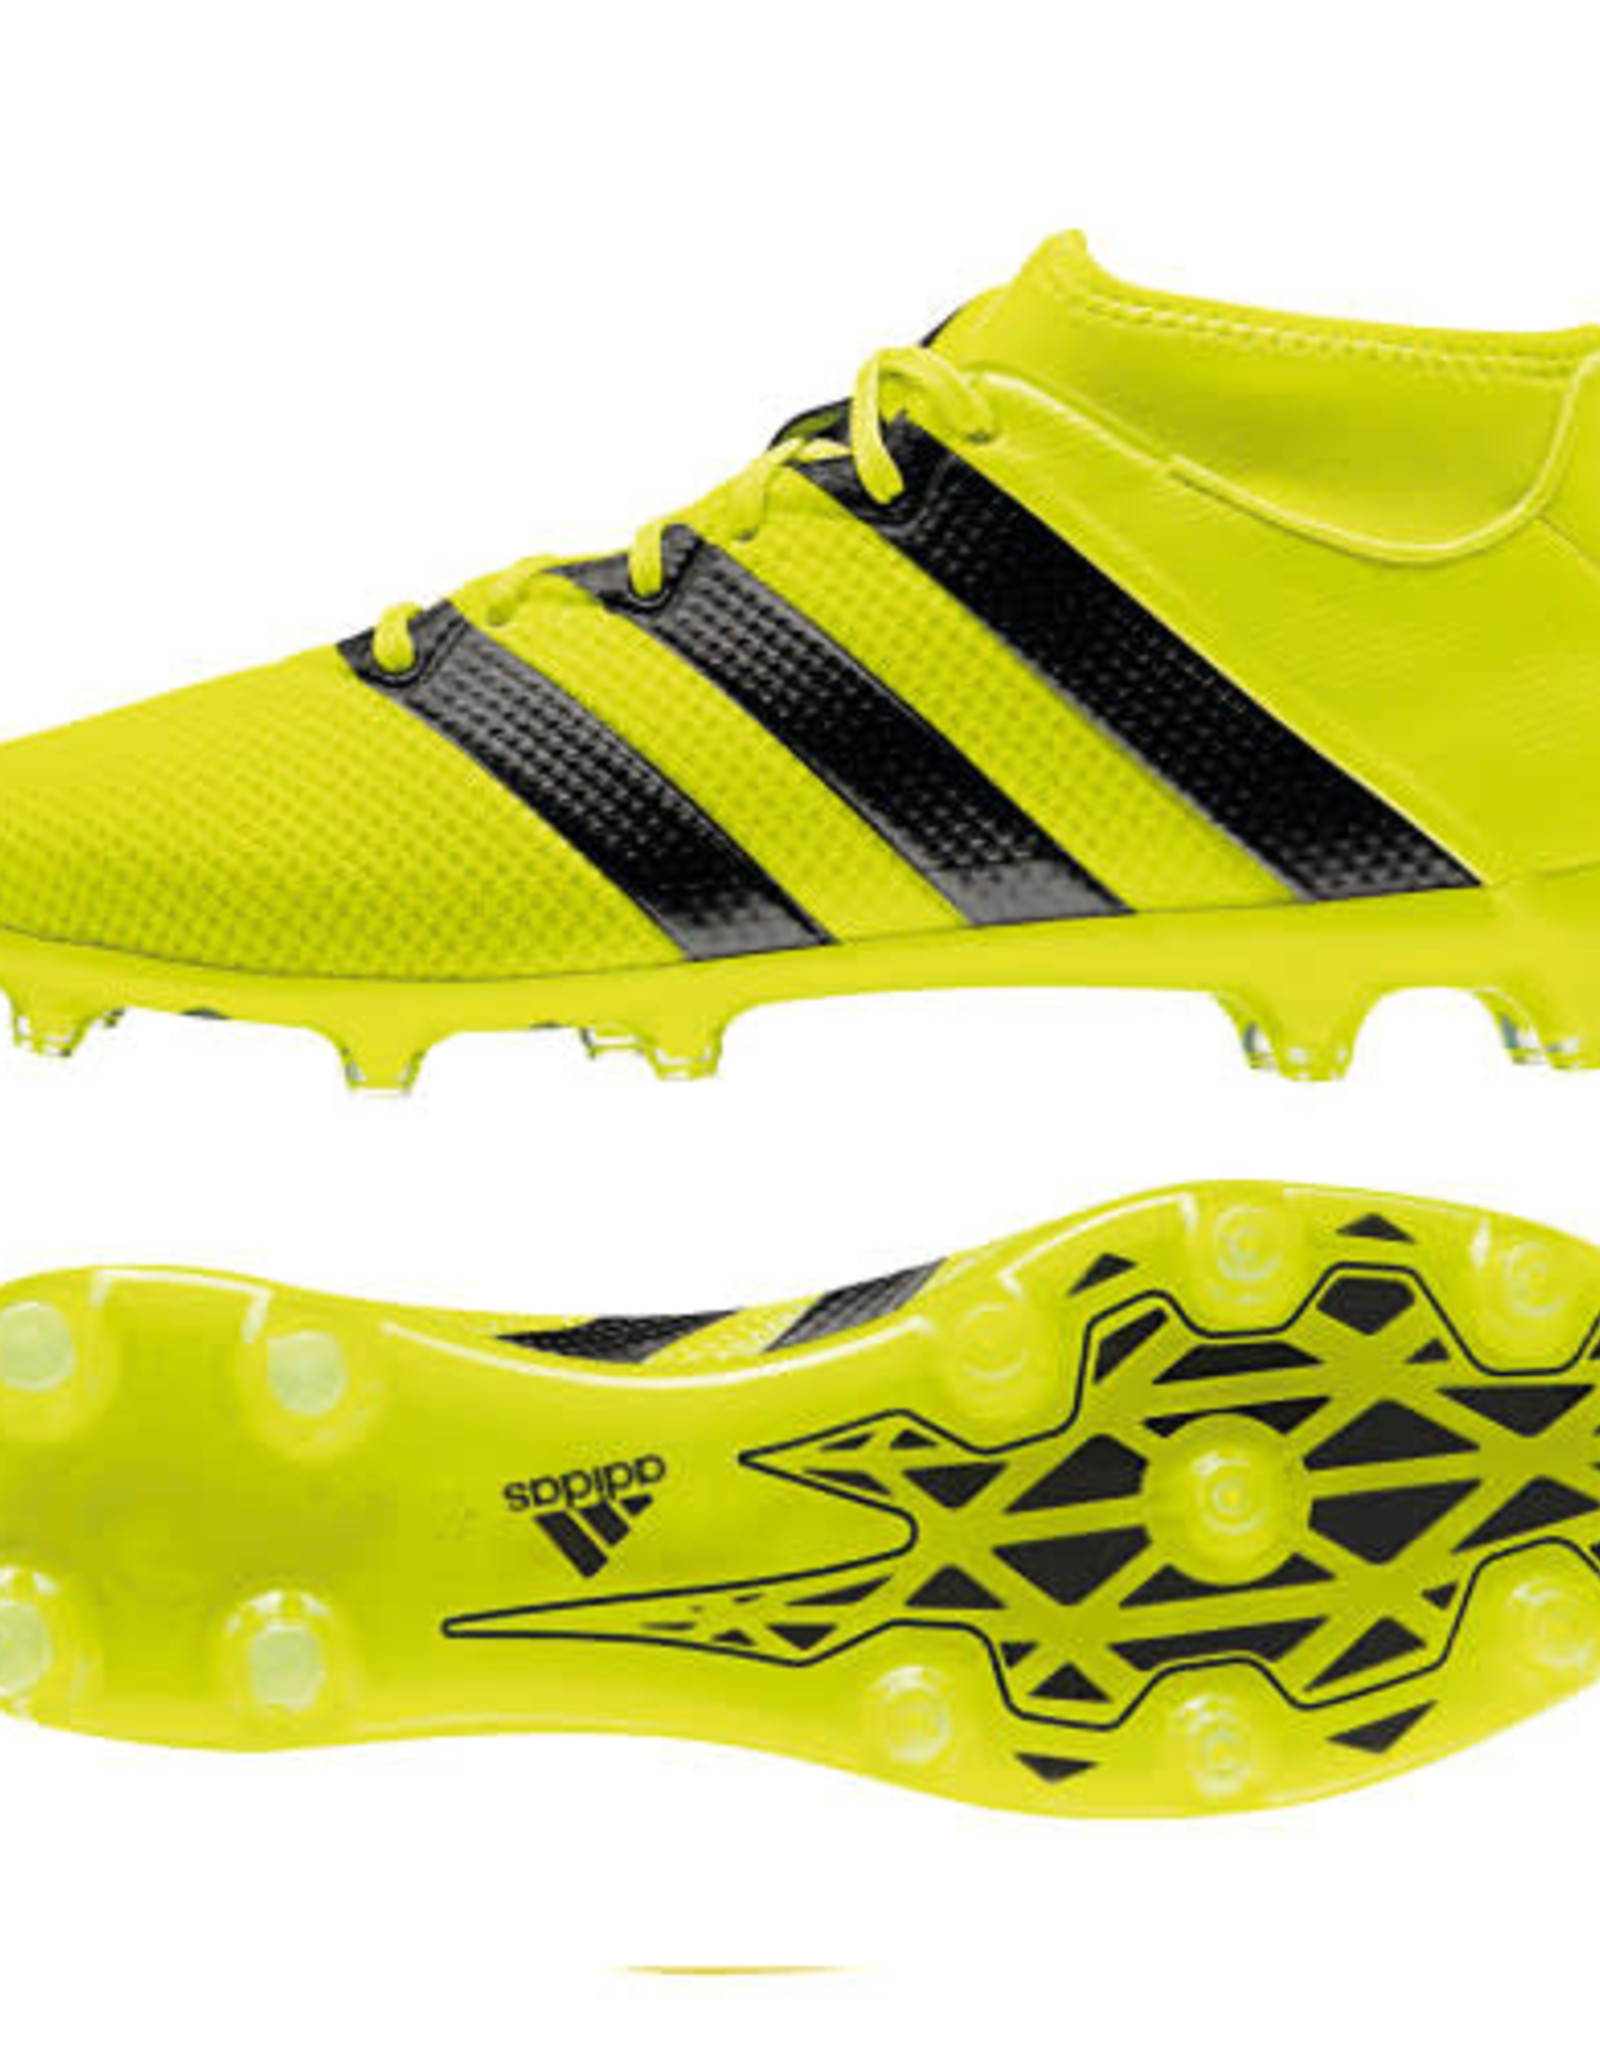 Adidas Adidas Ace 16.2 Primemesh FG